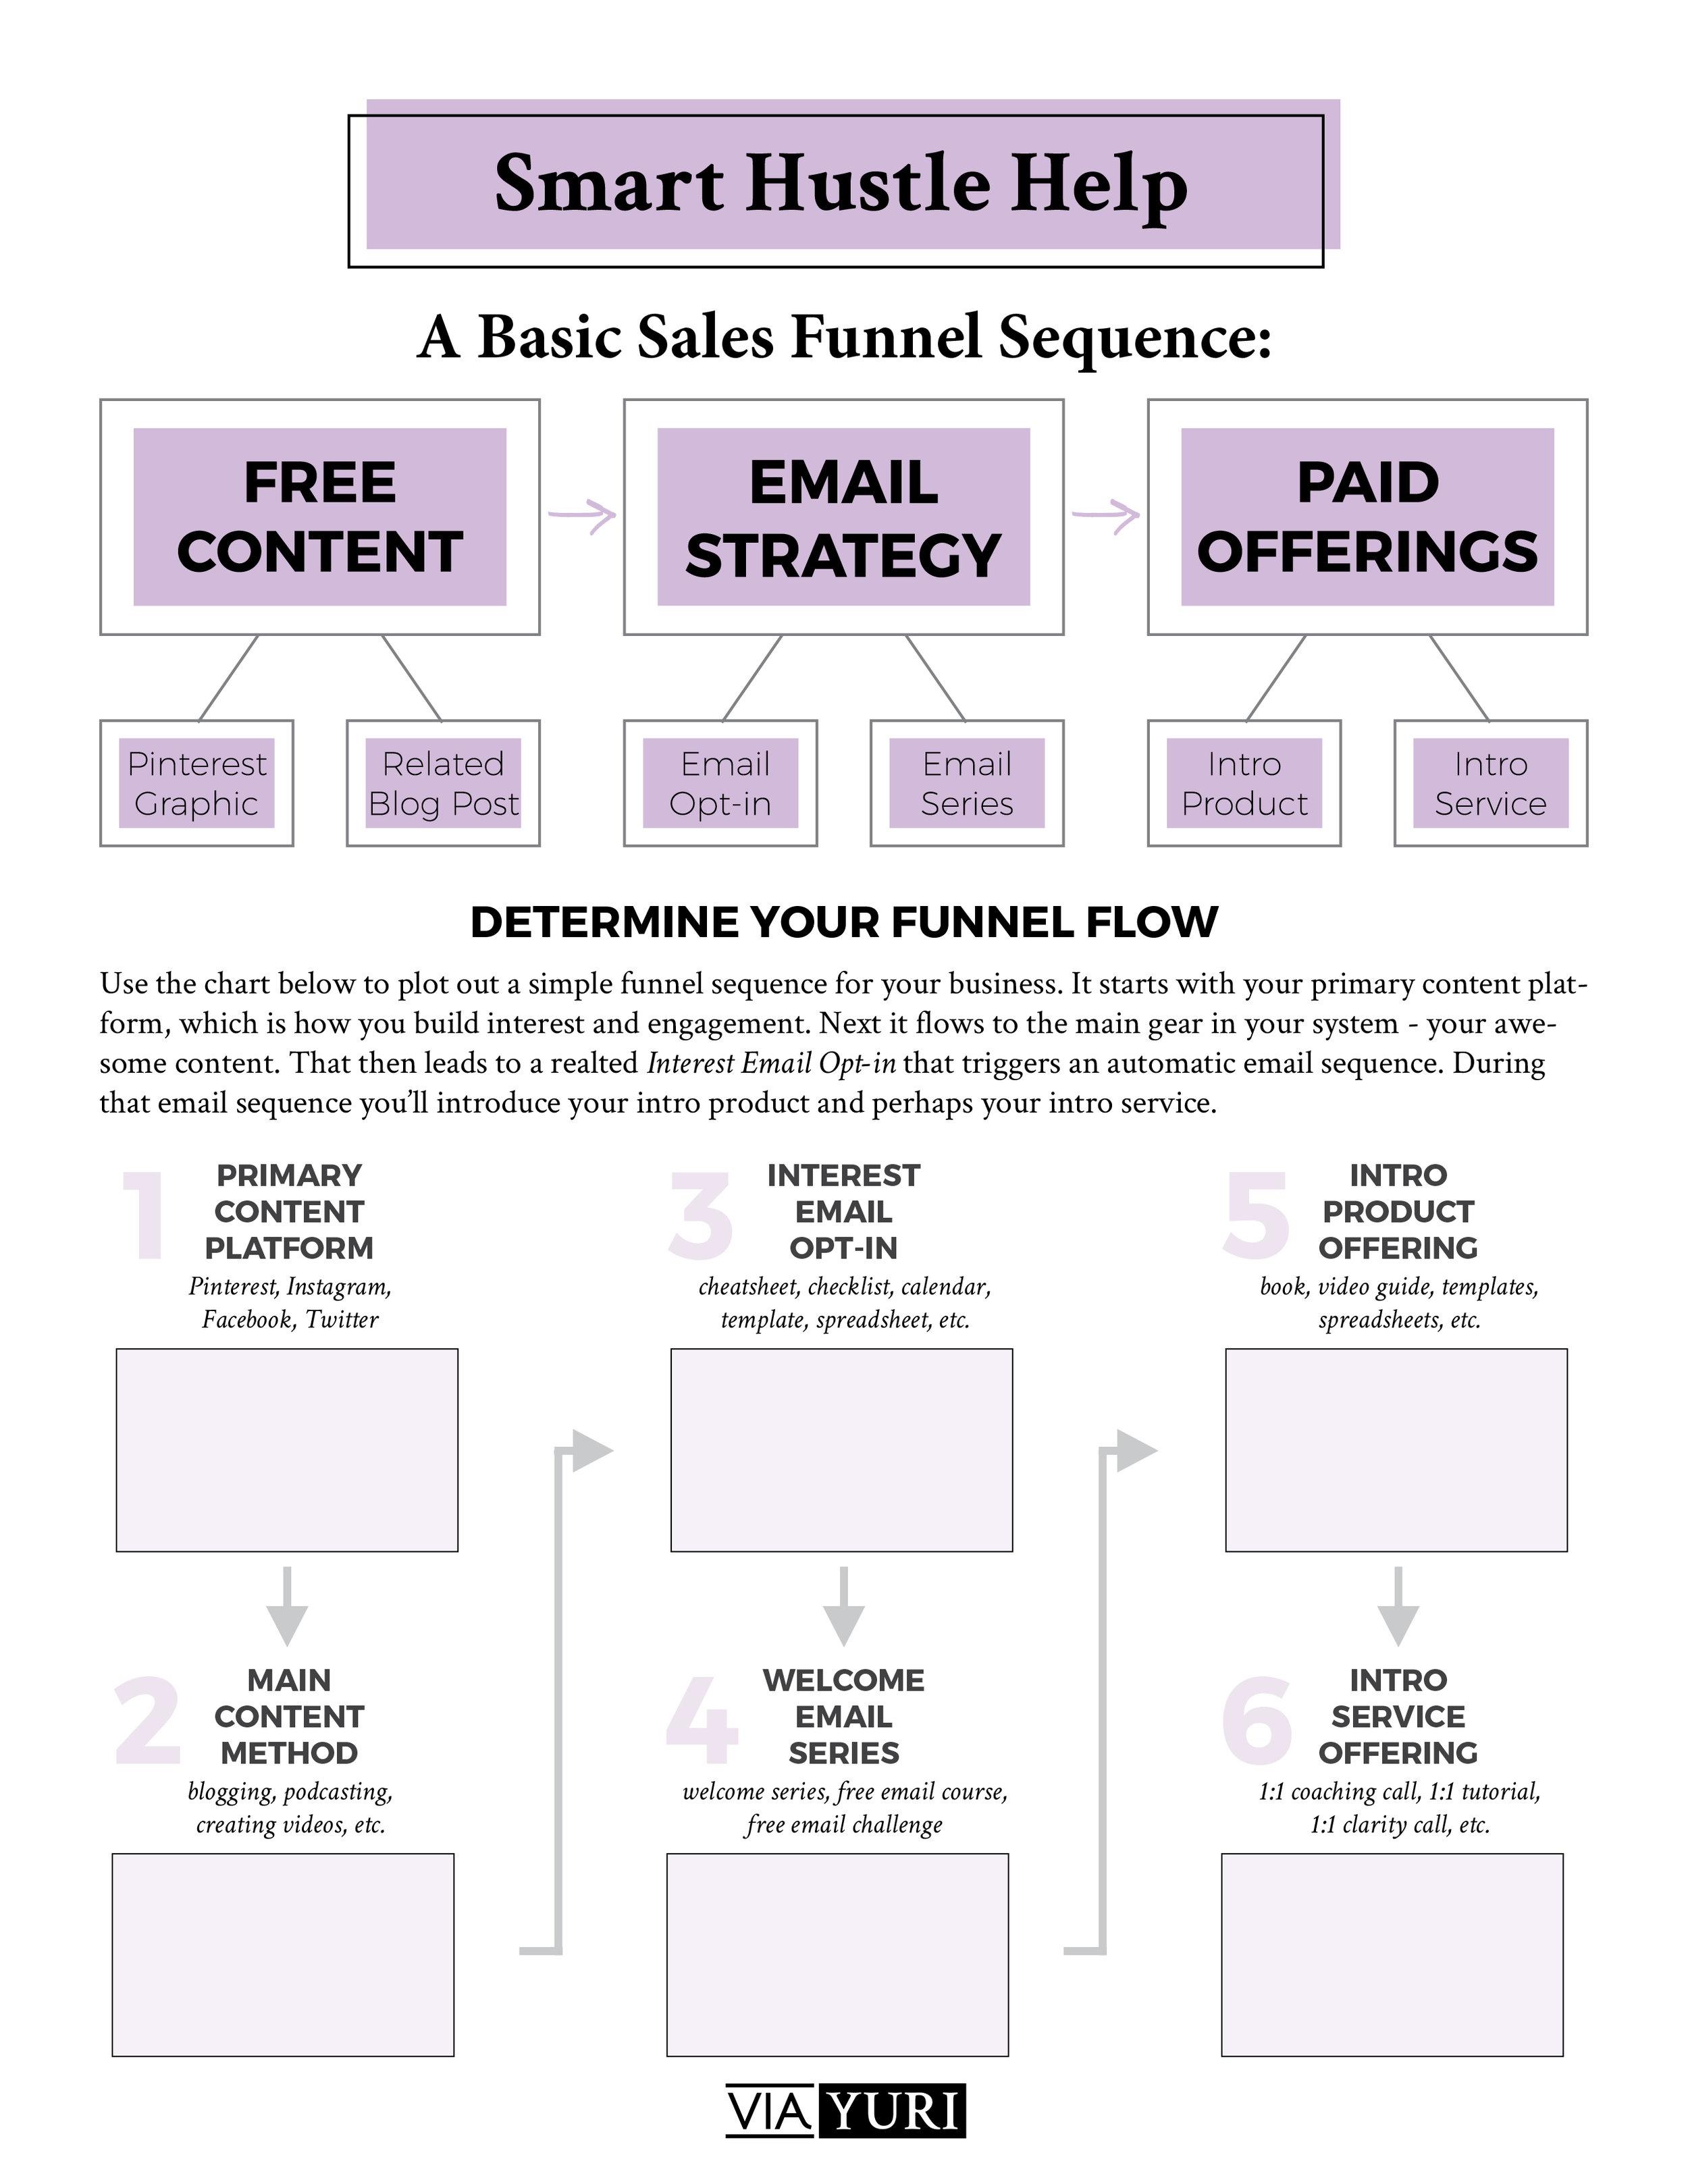 Form Your Funnel Worksheet || The Side Hustle Quickstart Roadmap Free Course Worksheets | viaYuri.com